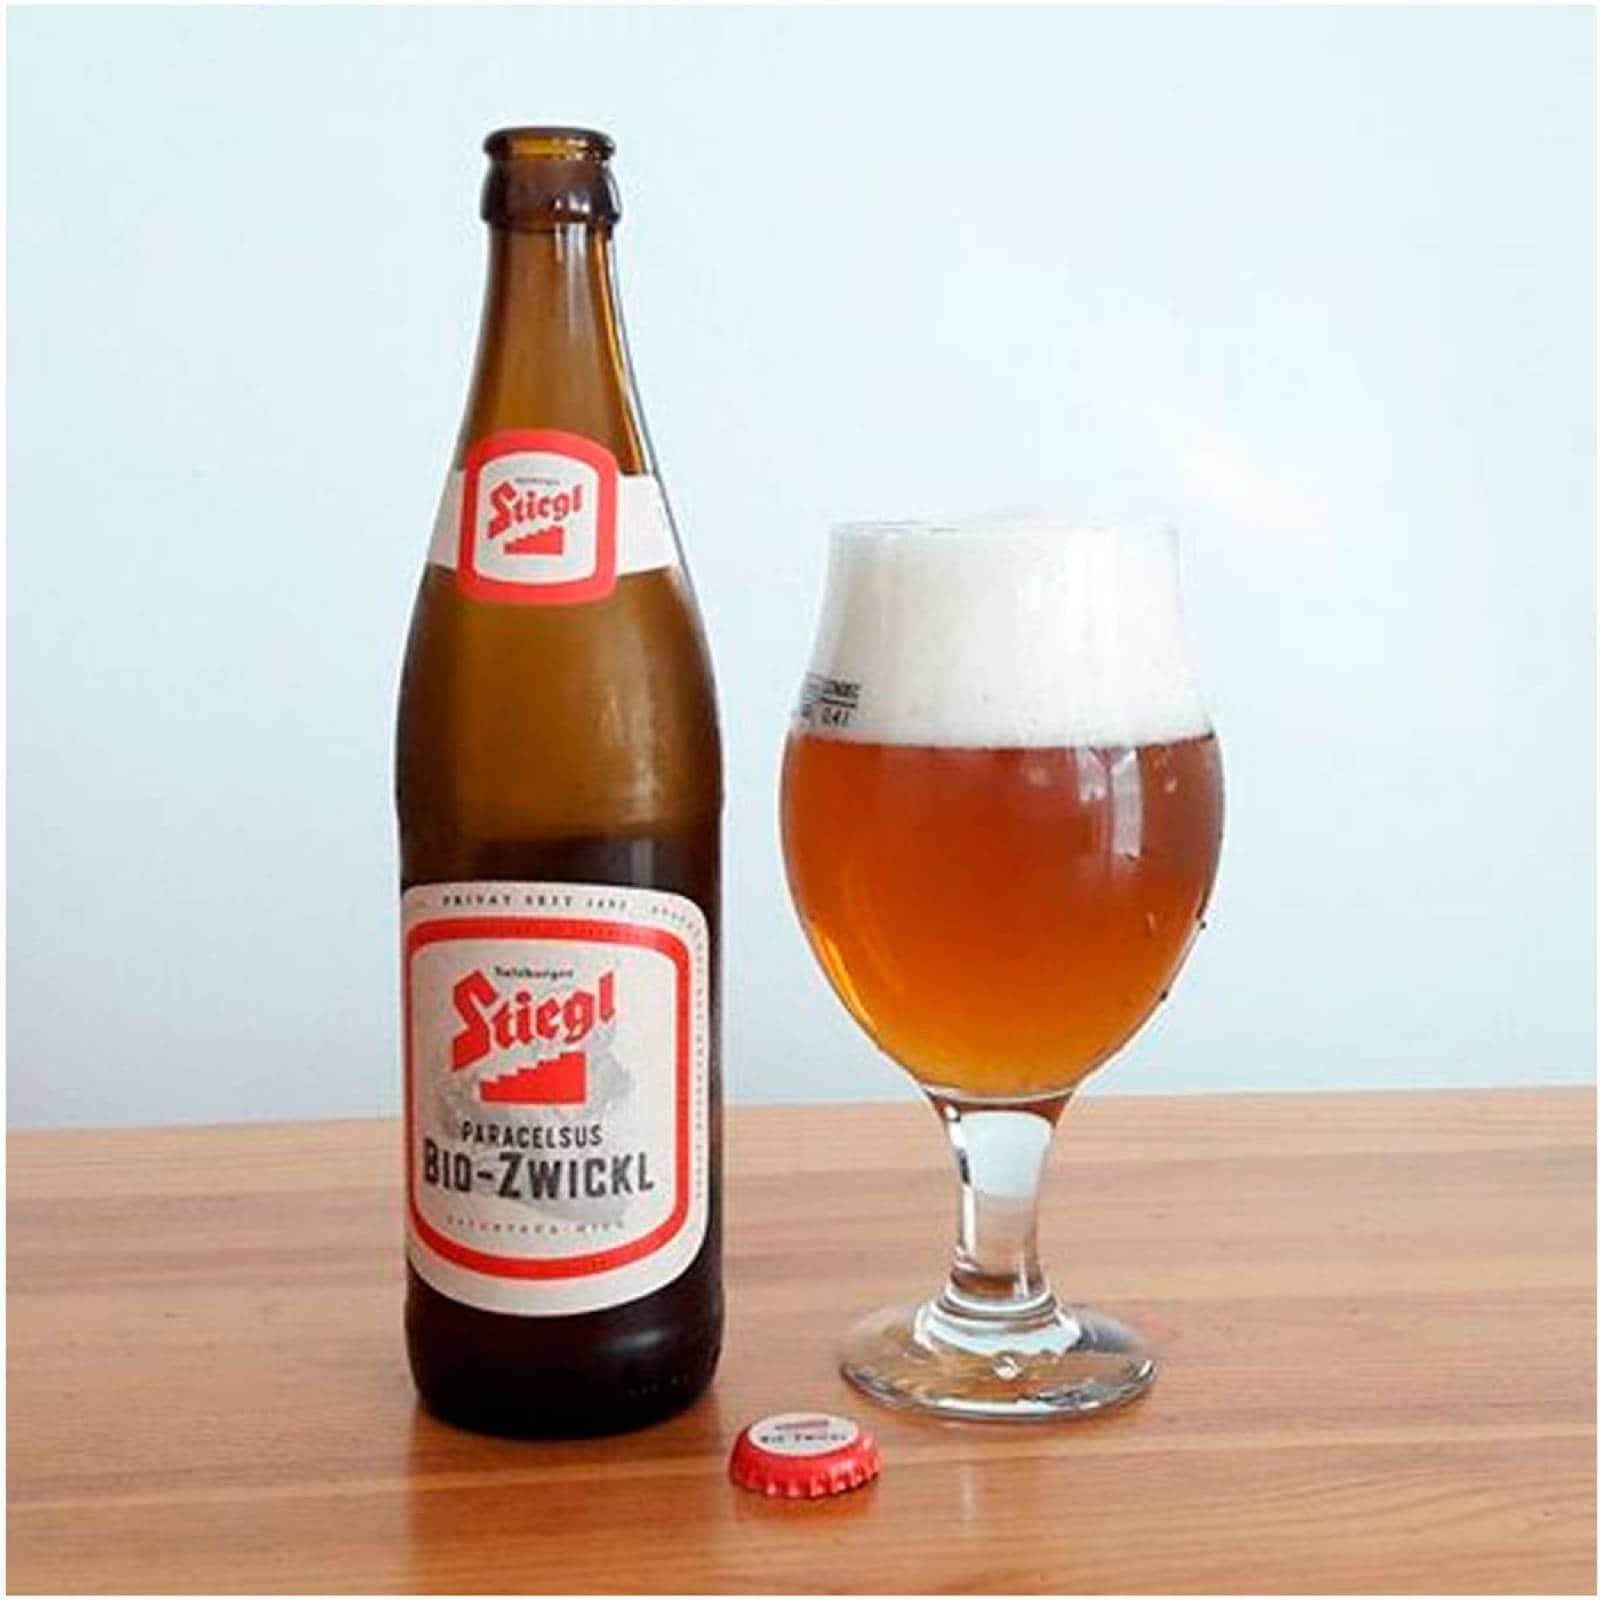 Cerveza Importada 20 Pzs 500 ml Stiegl Paracelsus Bio-Zwickl